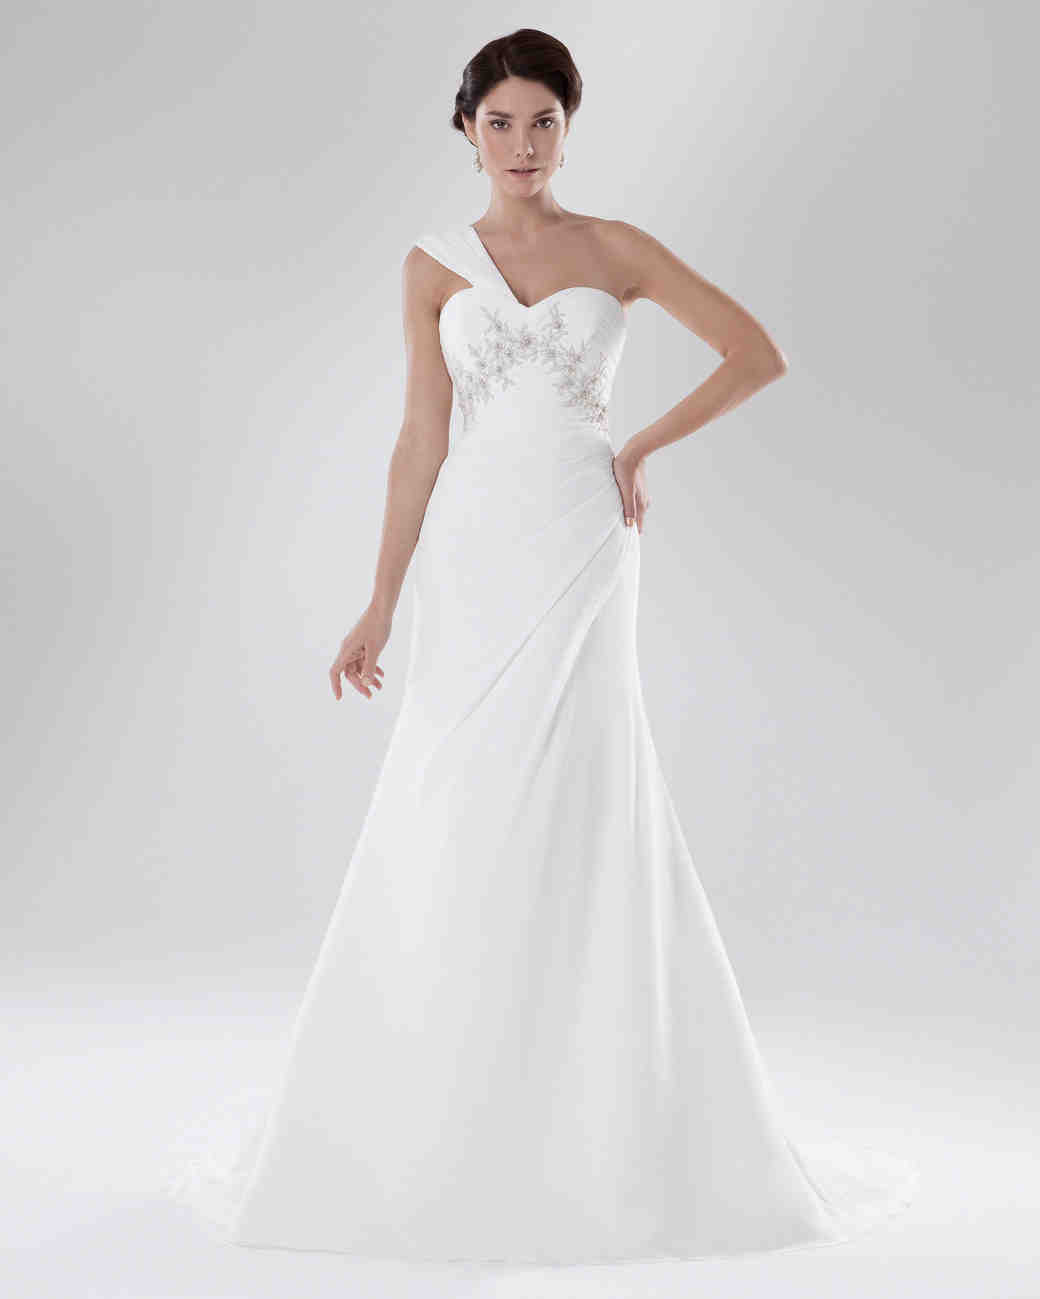 ellis-bridal-11265.jpg